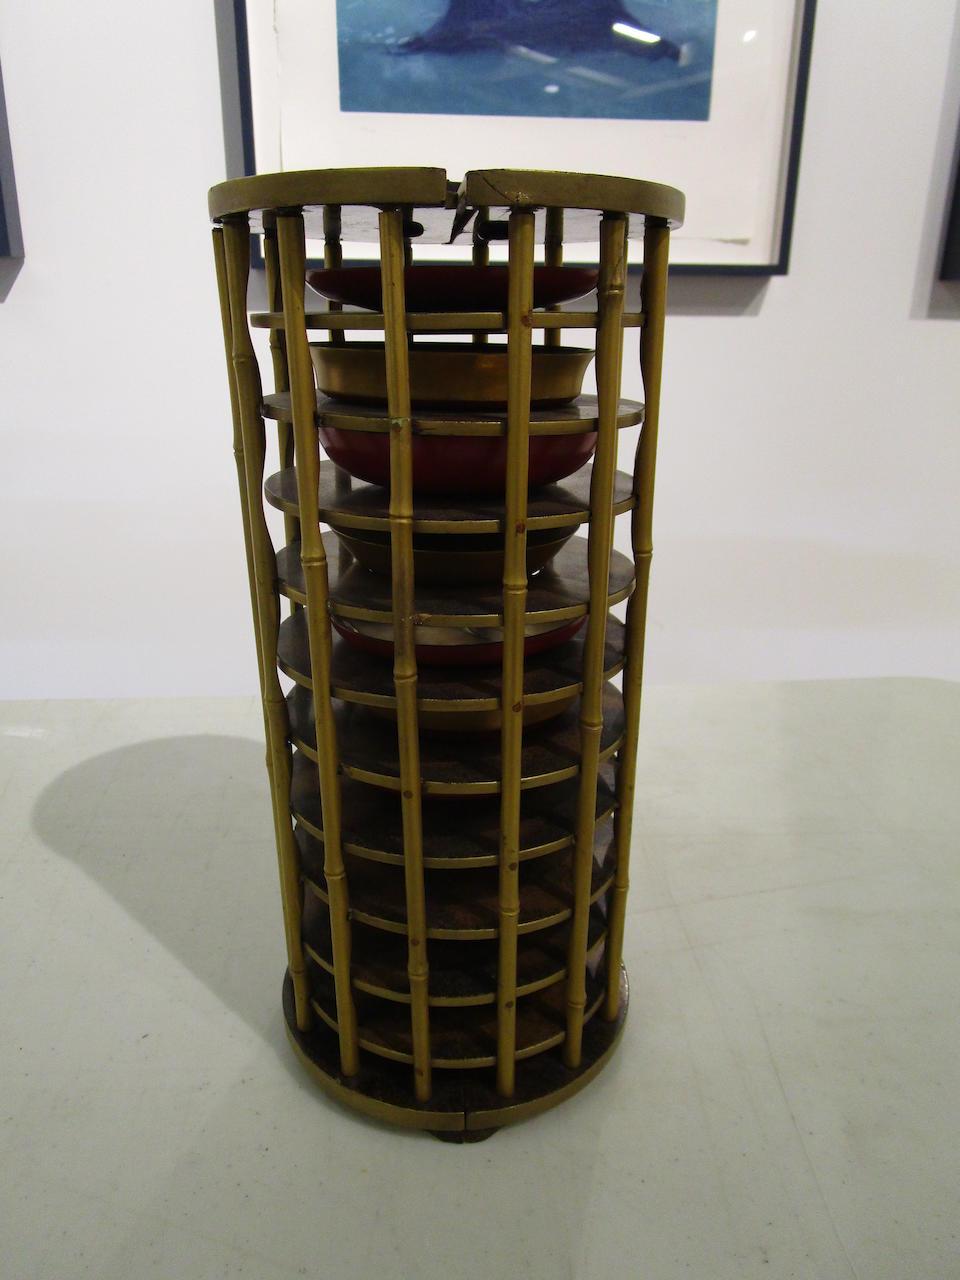 Yamada Jokasai (active 19th century) A set of ten lacquer sake cups in a carrying caseEdo period (1615-1868), 19th century